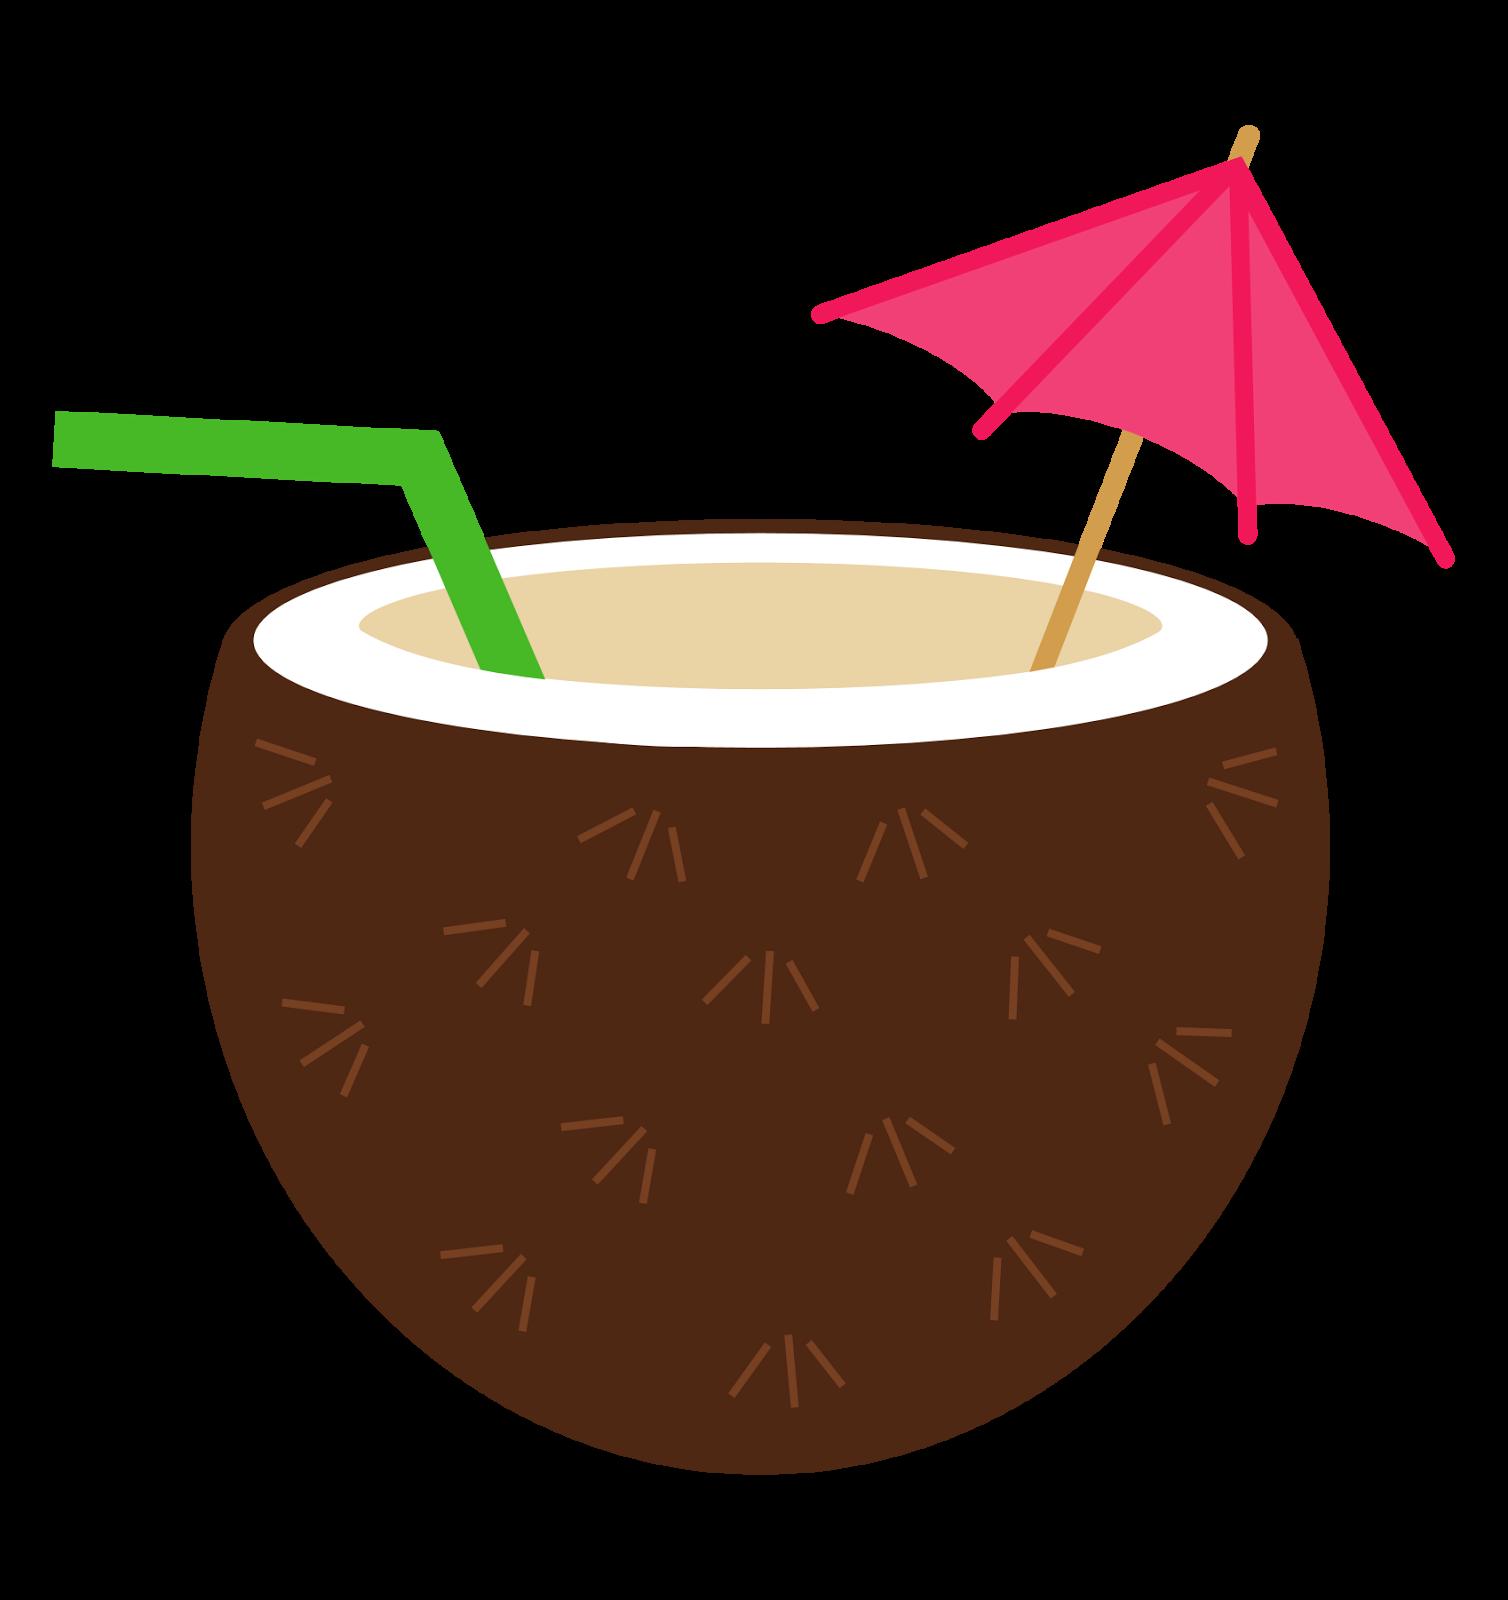 coconut%20clipart